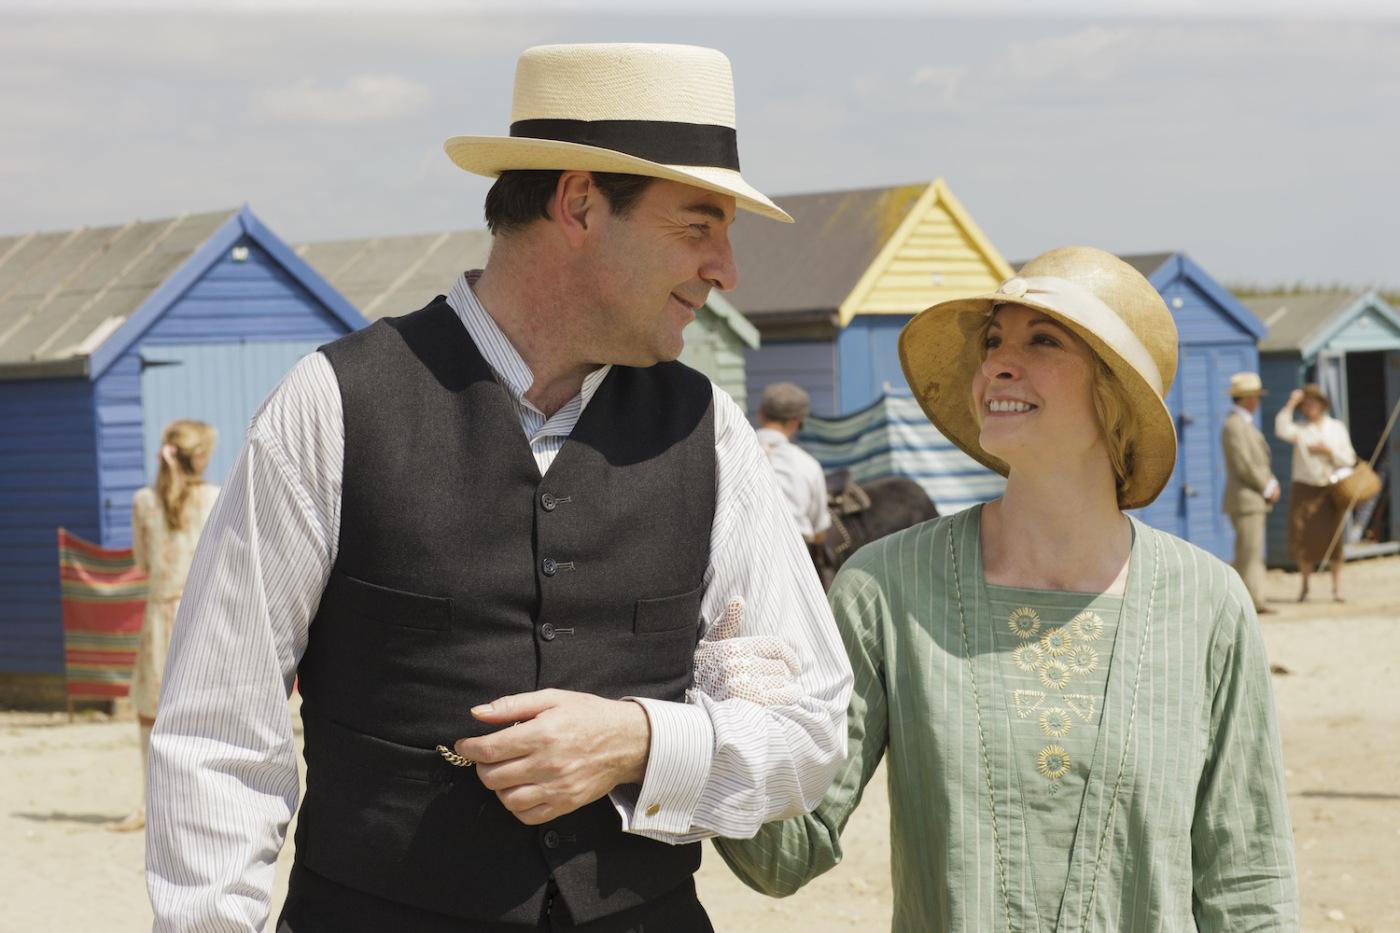 Brendan Coyle as Mr. Bates and Joanne Froggatt as Anna Bates